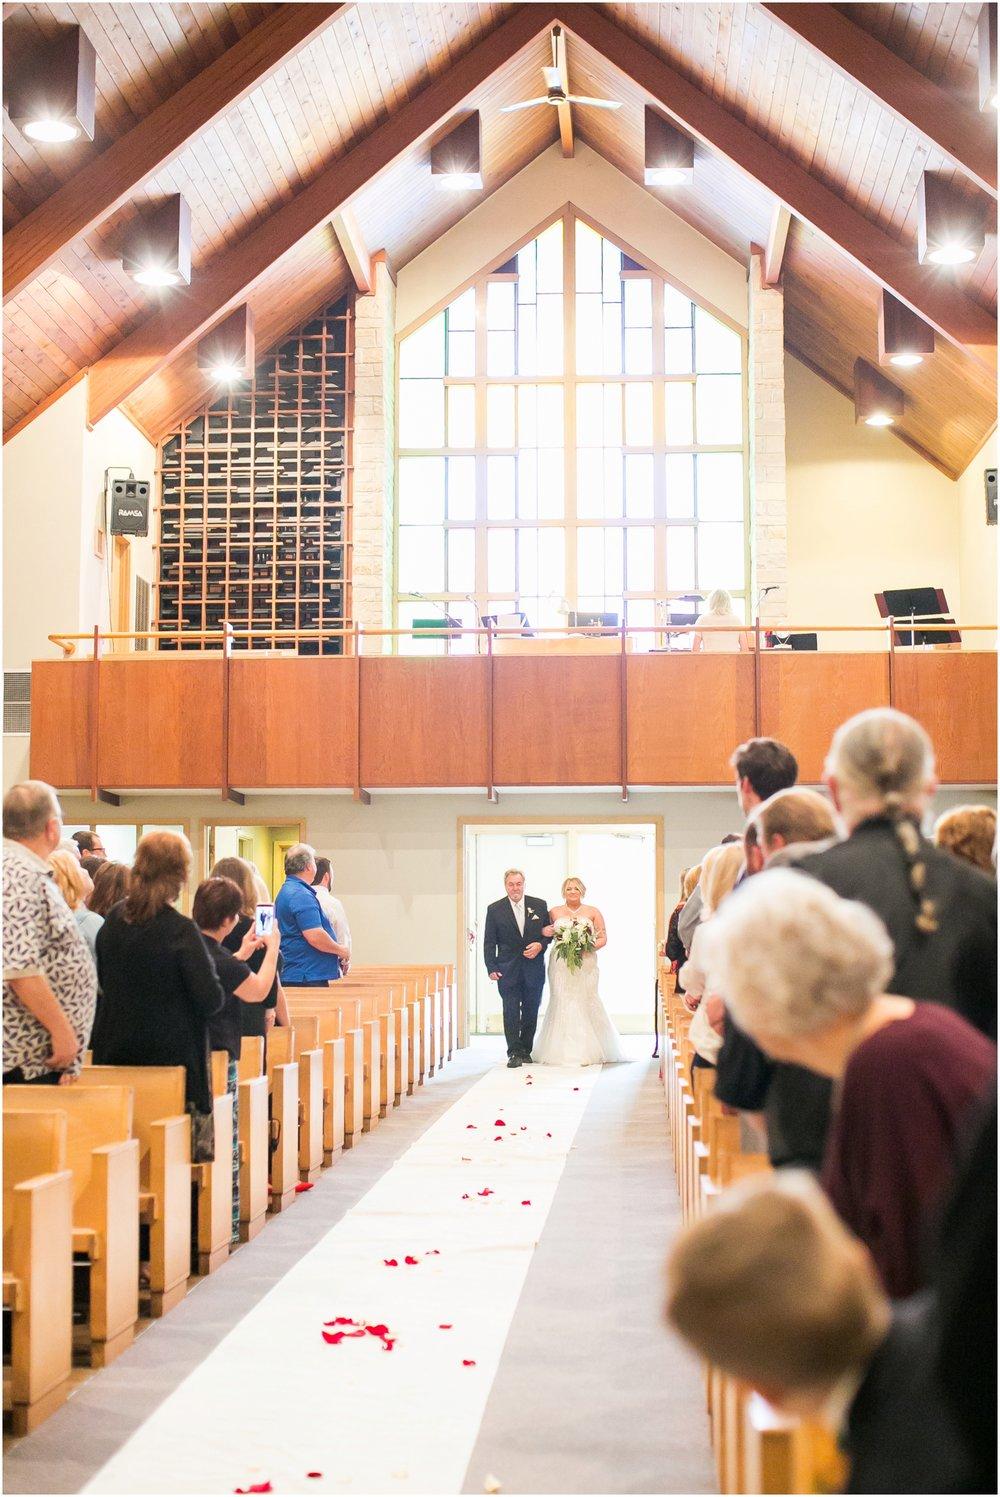 Germanton_Wisconsin_Florian_Park_Conference_Center_Wedding_2143.jpg